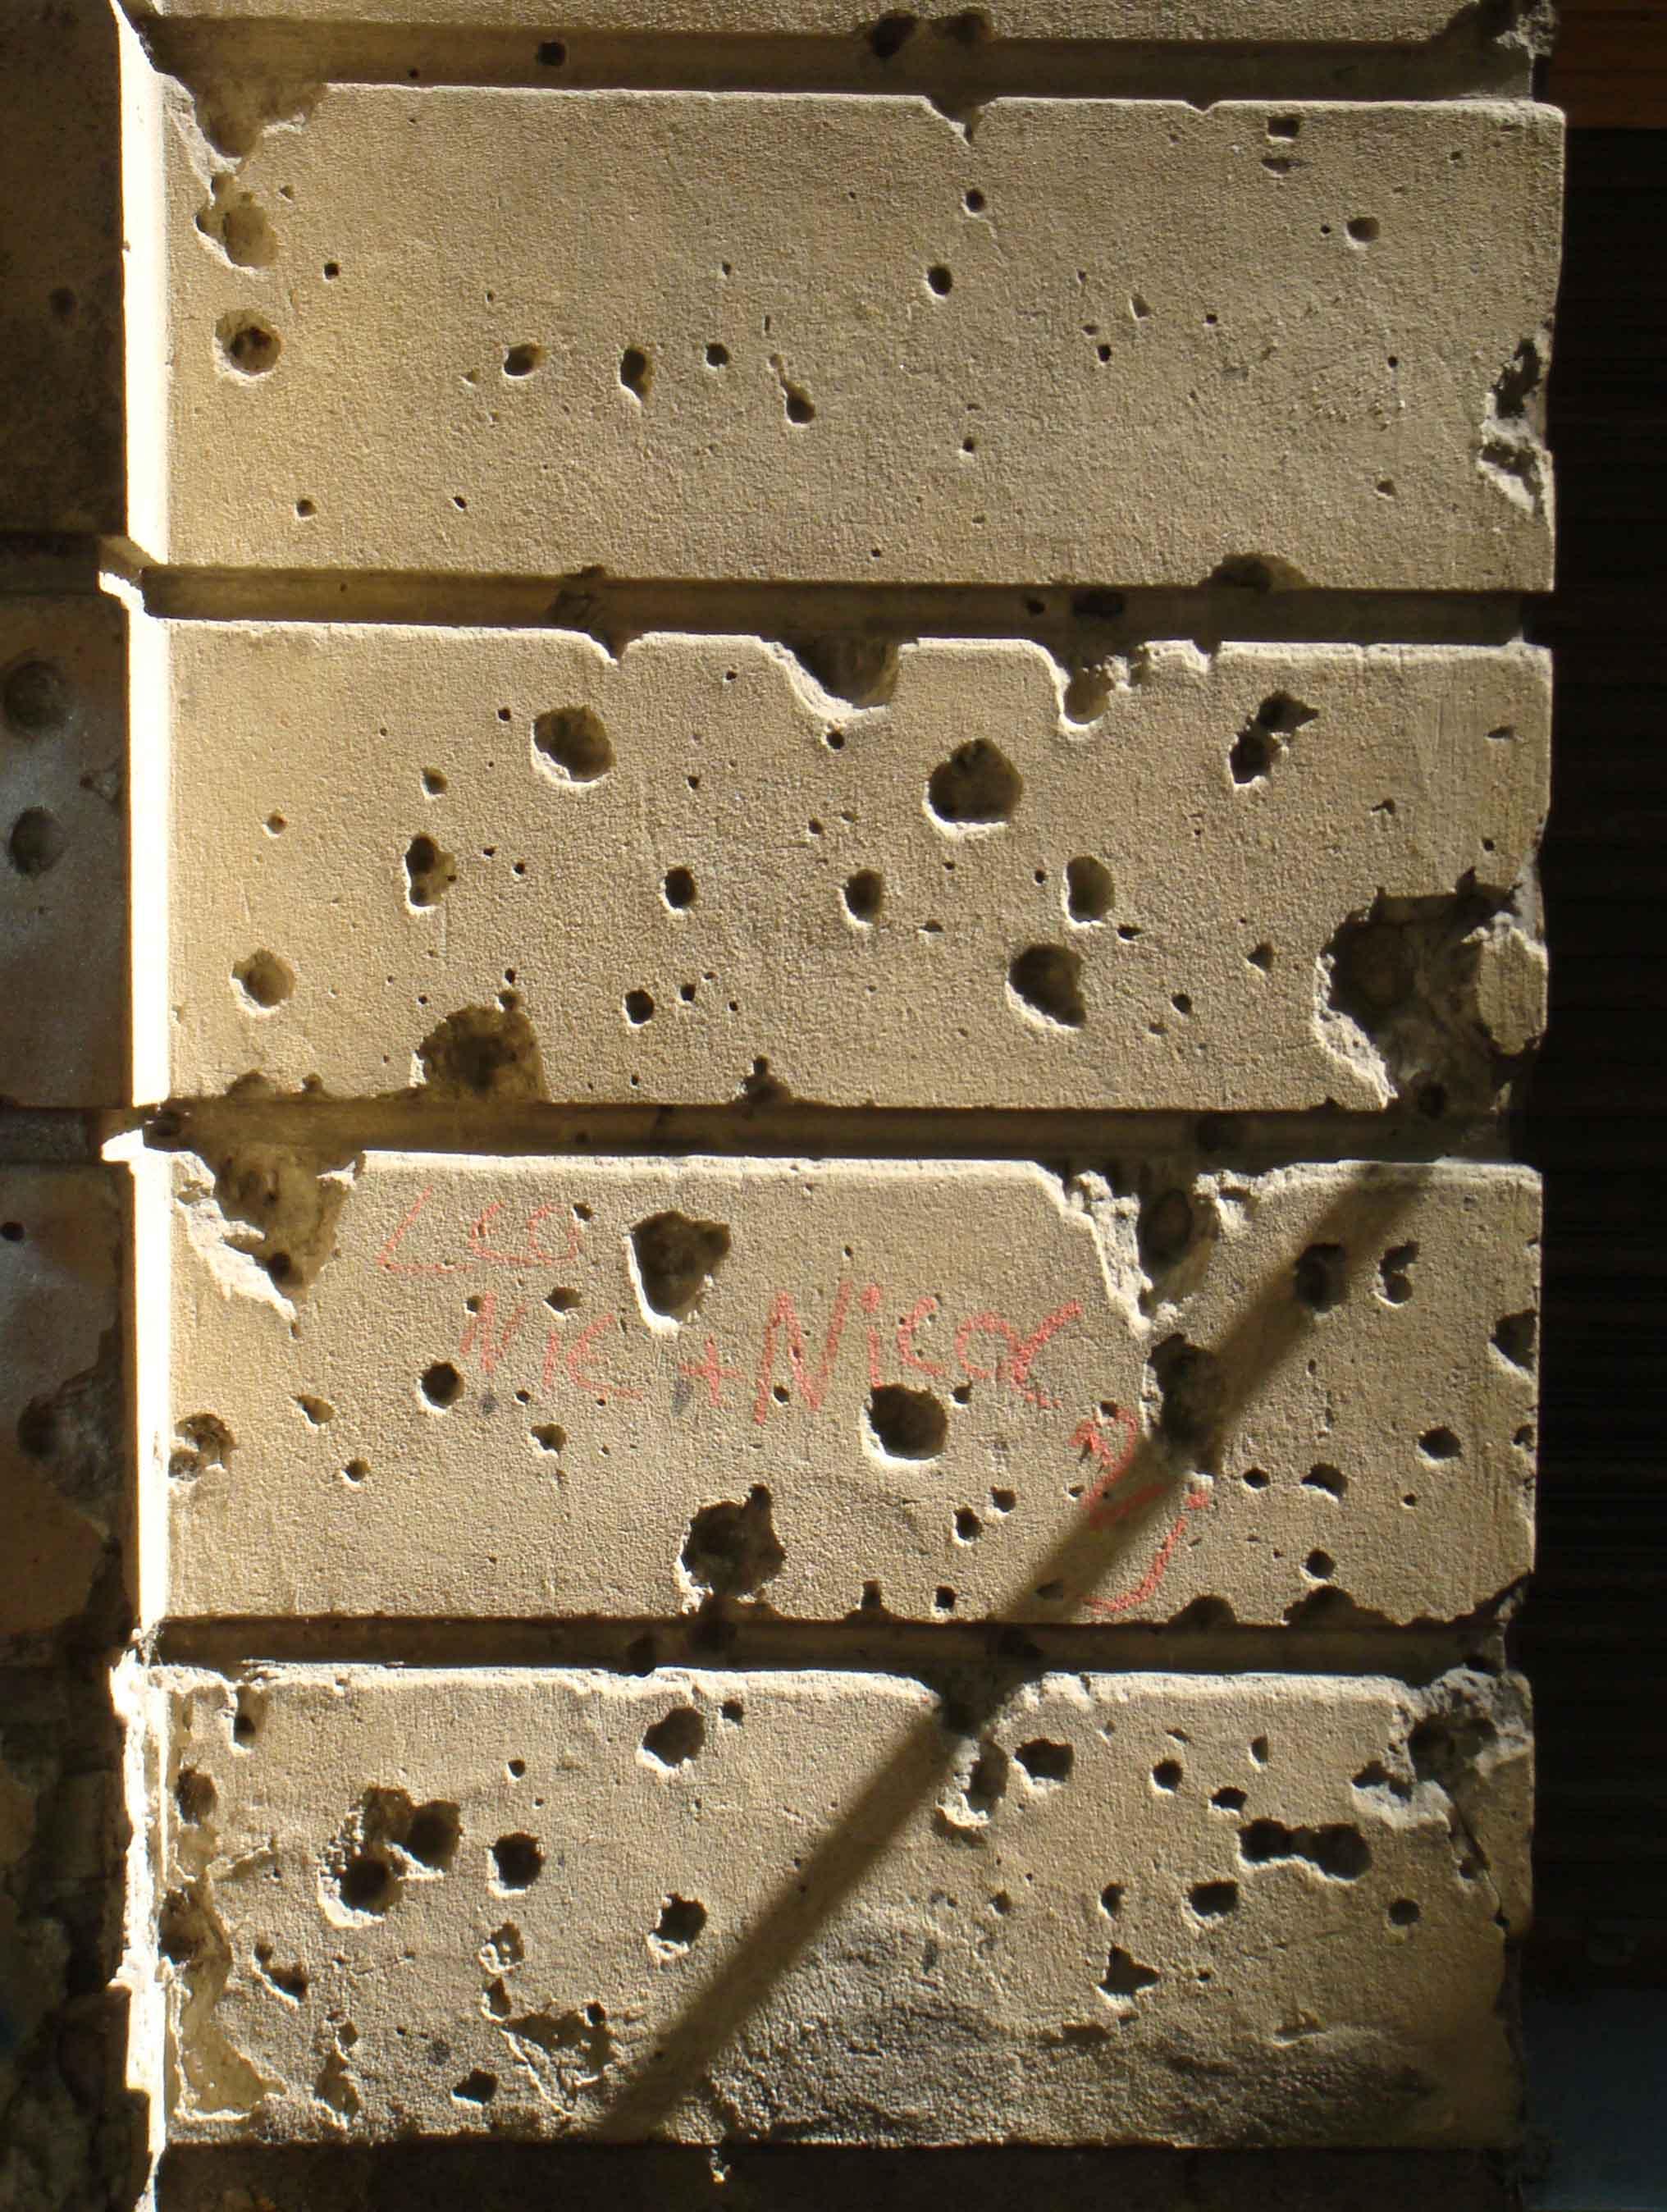 Berlin bullet holes in wall